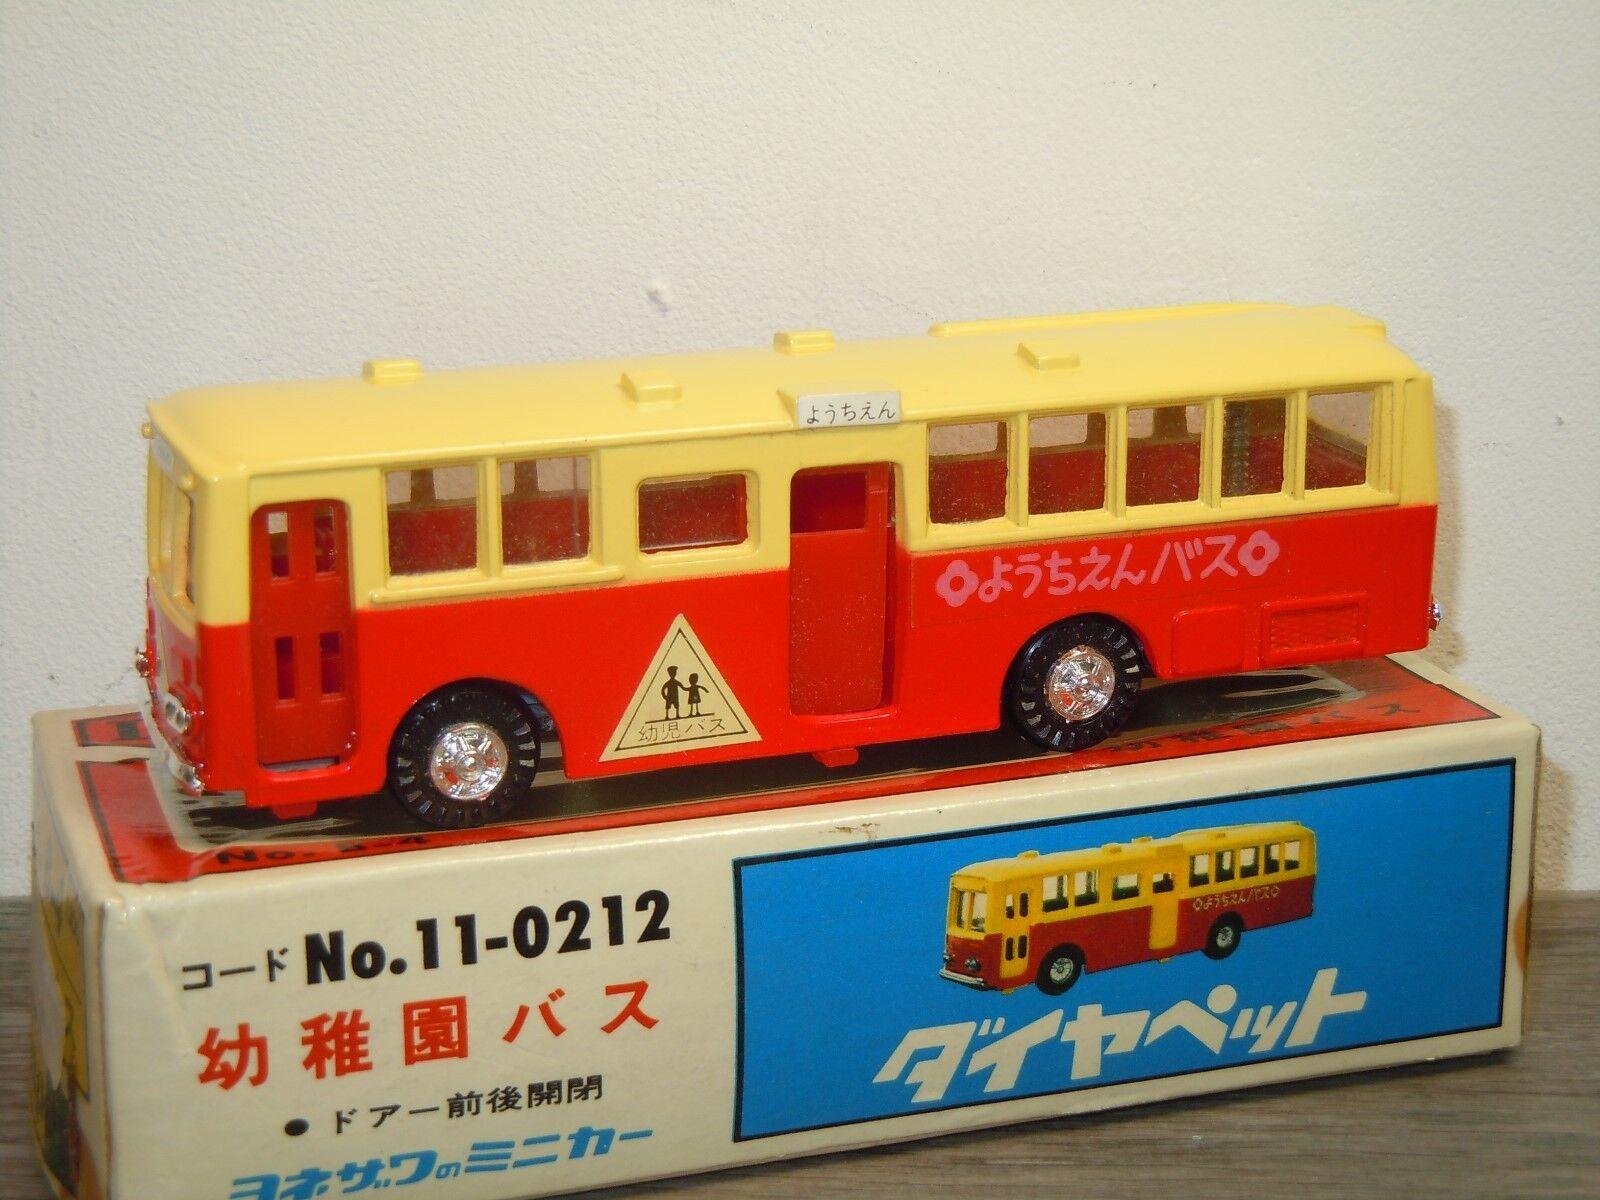 Schulbus - diapet - yonezawa - spielzeug in japan  35764 b - box